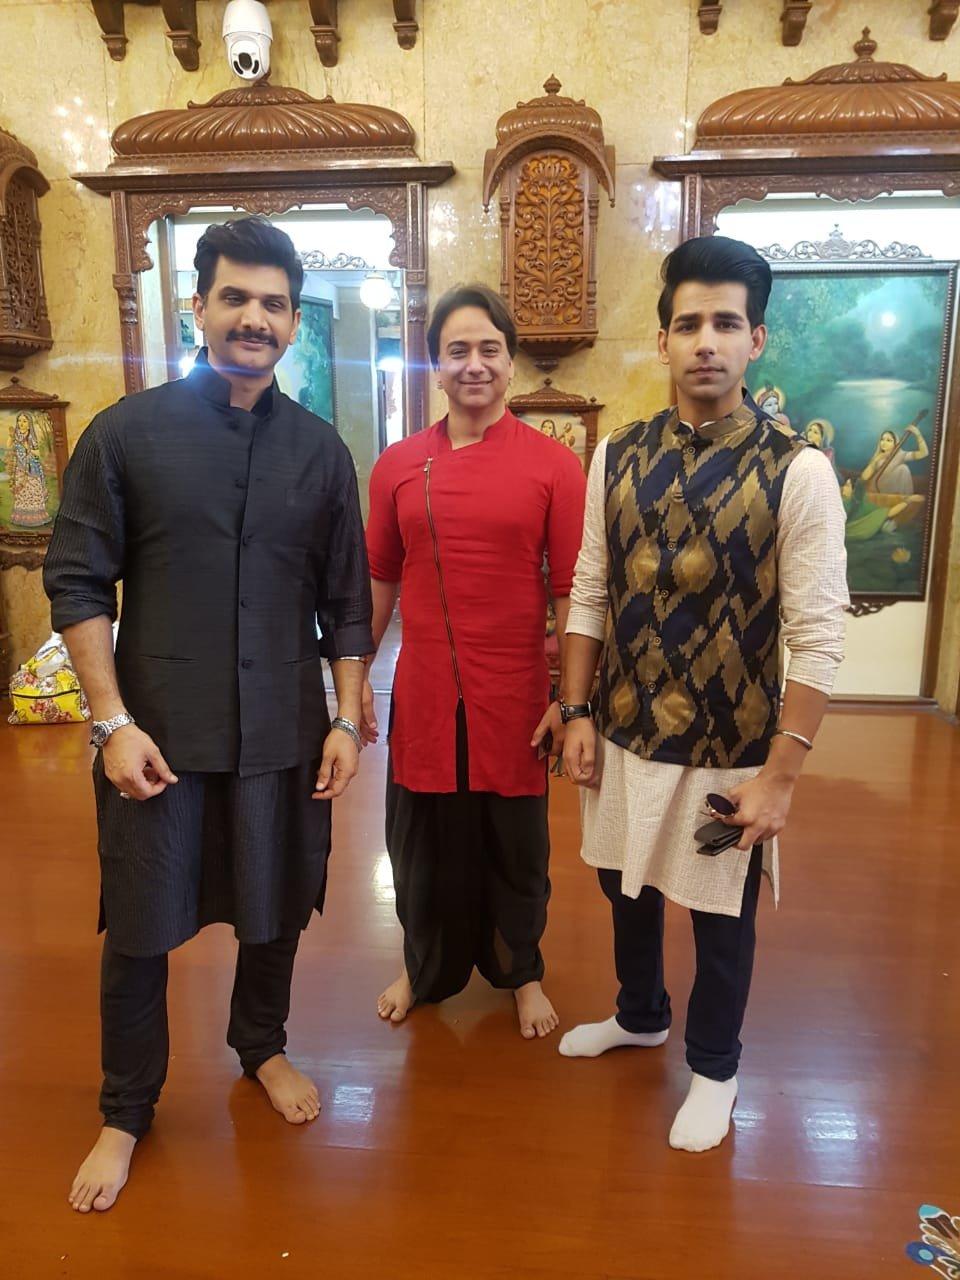 Yeh Rishta Kya Kehlata Hai actress Parul Chauhan gets married to Chirag Thakkar